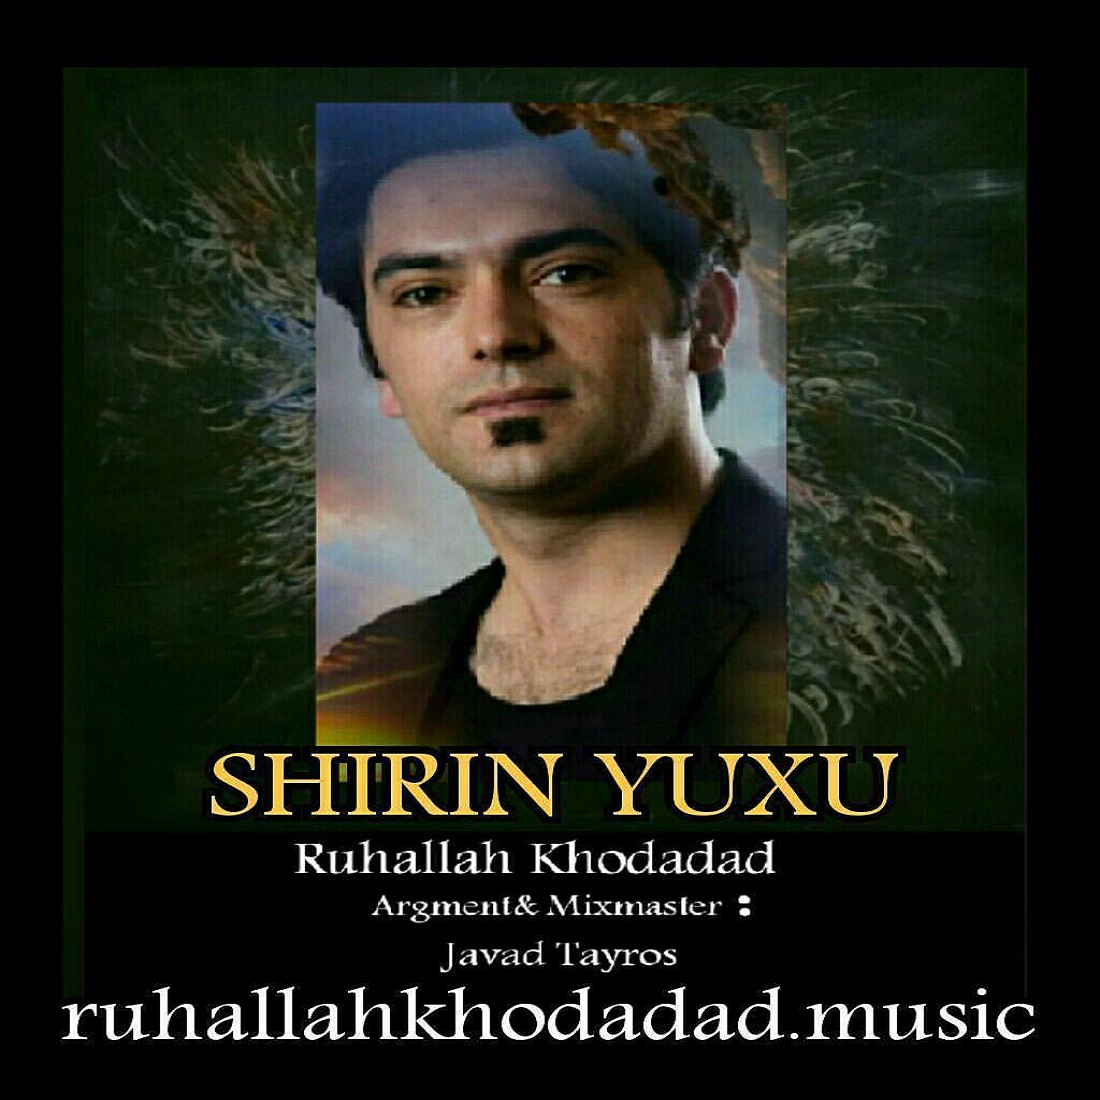 http://s9.picofile.com/file/8326904176/28Ruhallah_Khodadad_Shirin_Yuxu.jpg